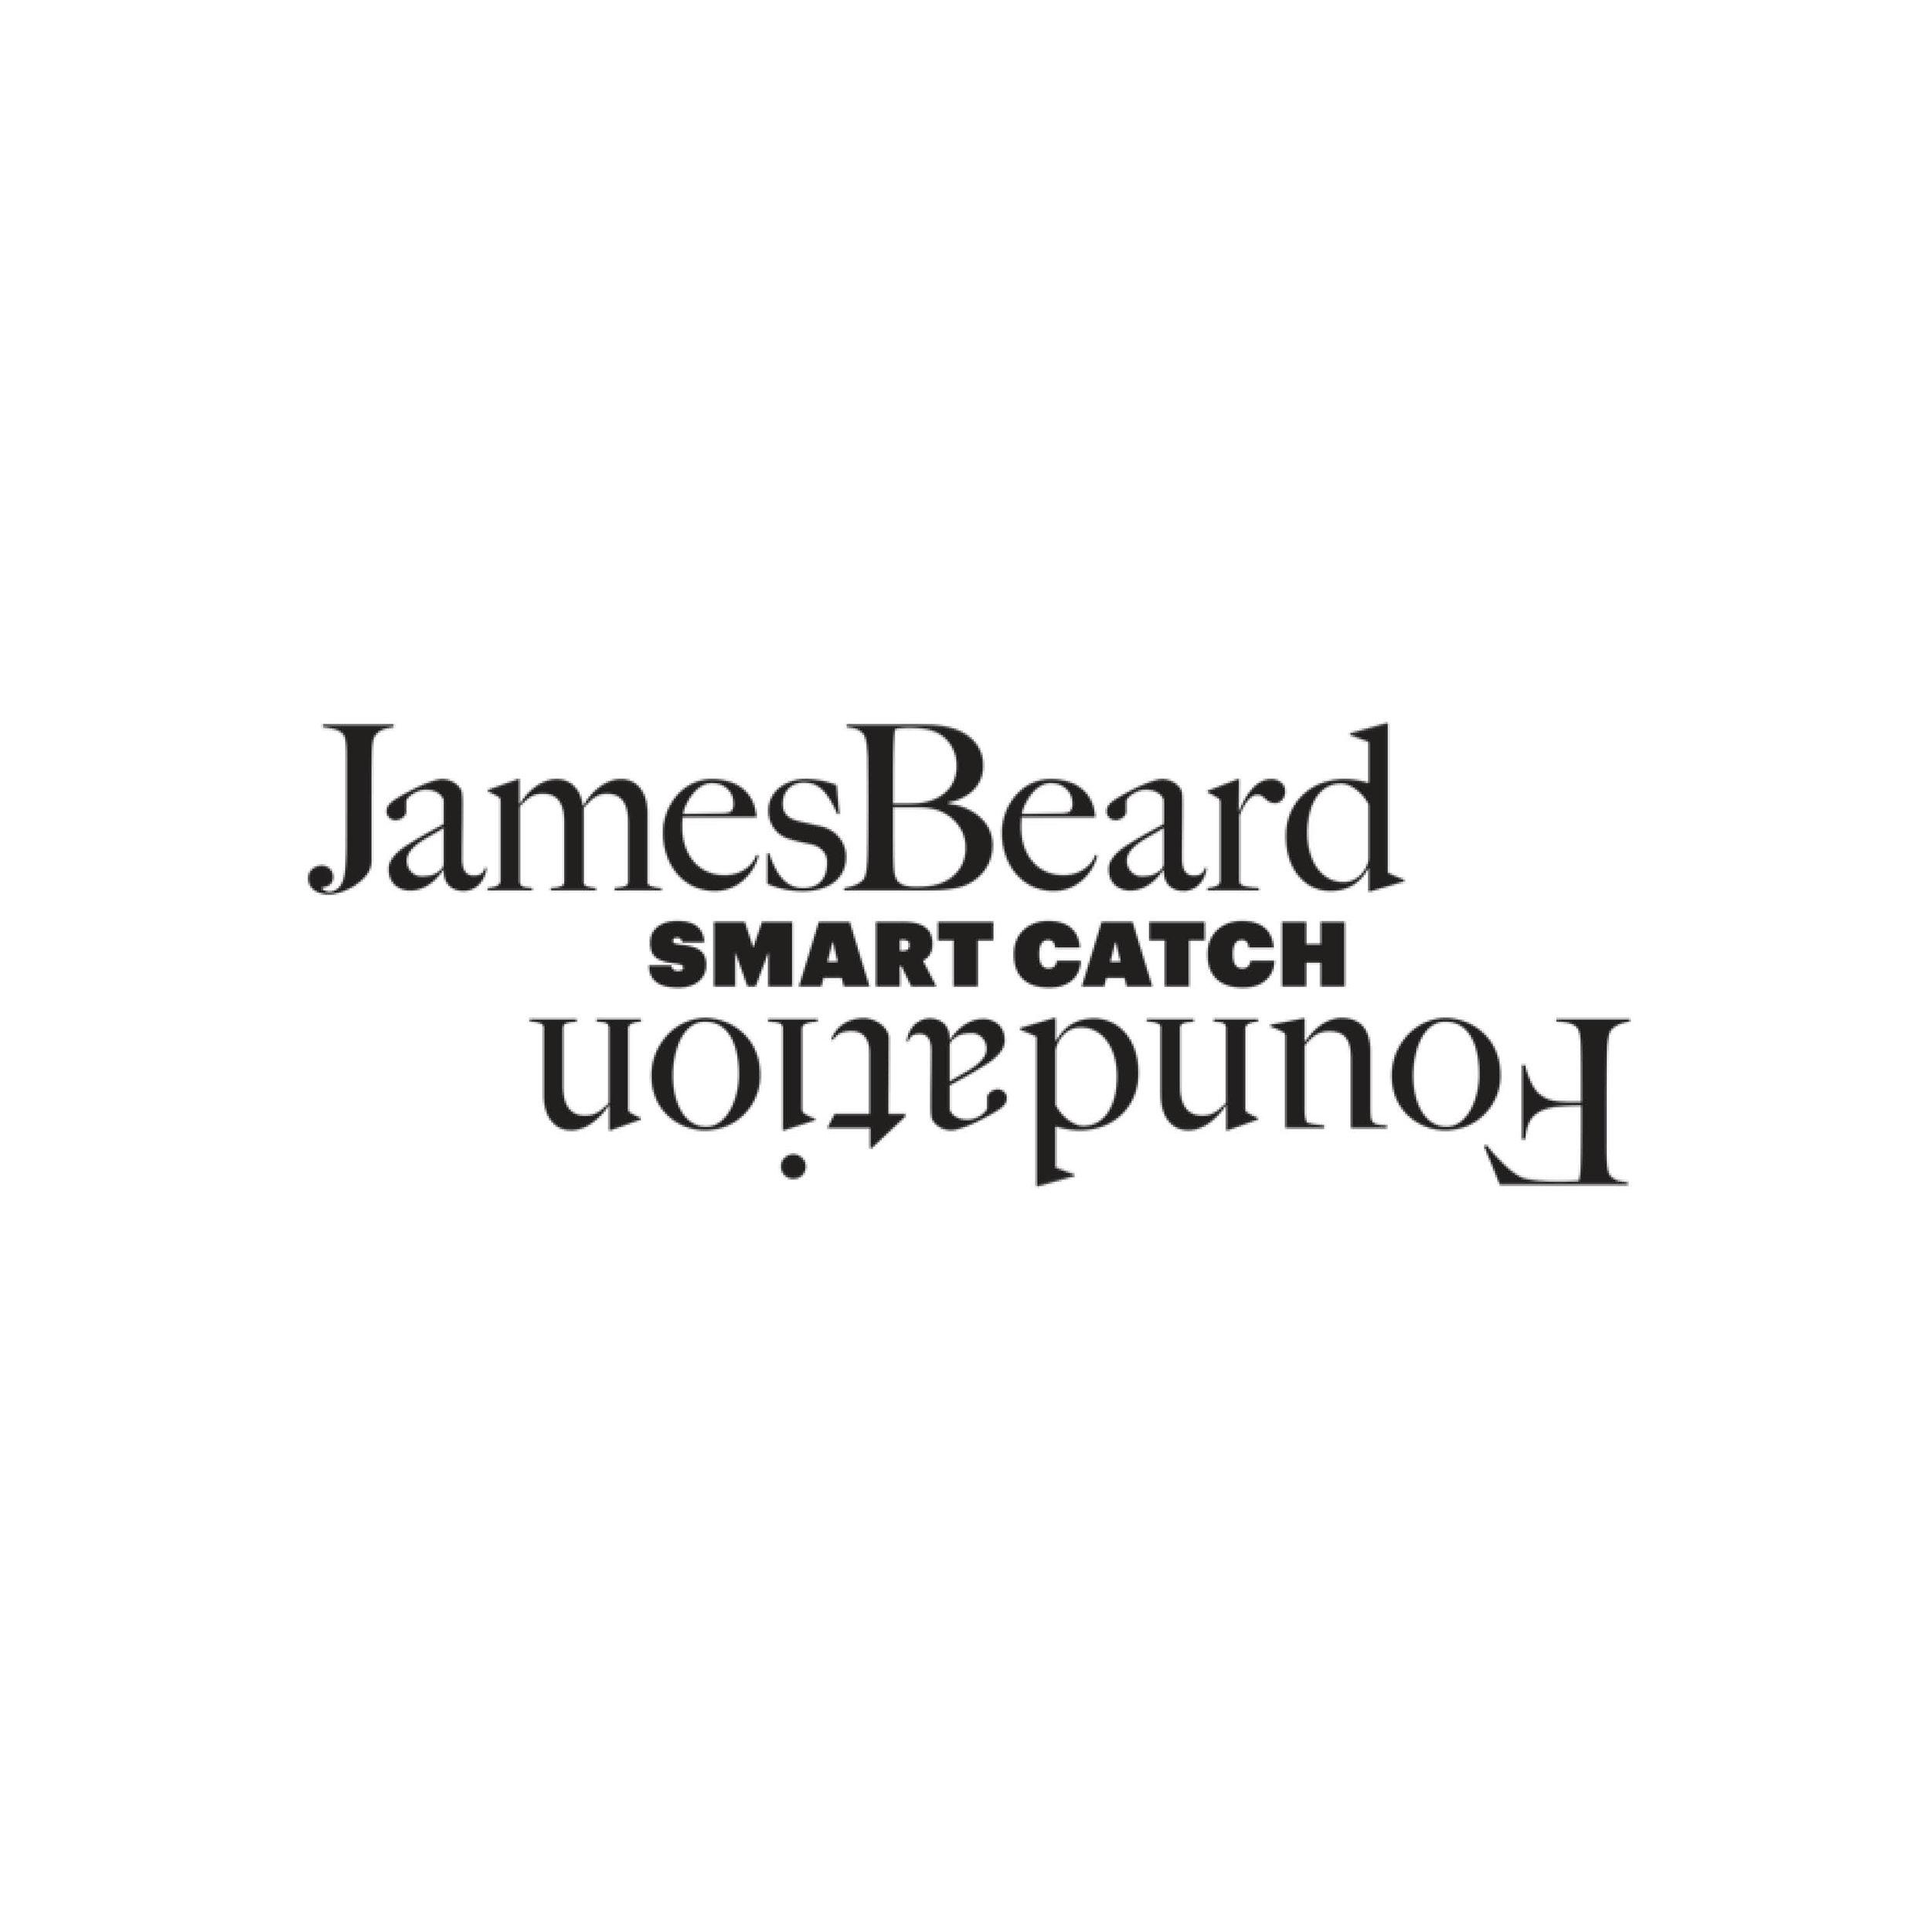 jamesbeard_logo.jpg